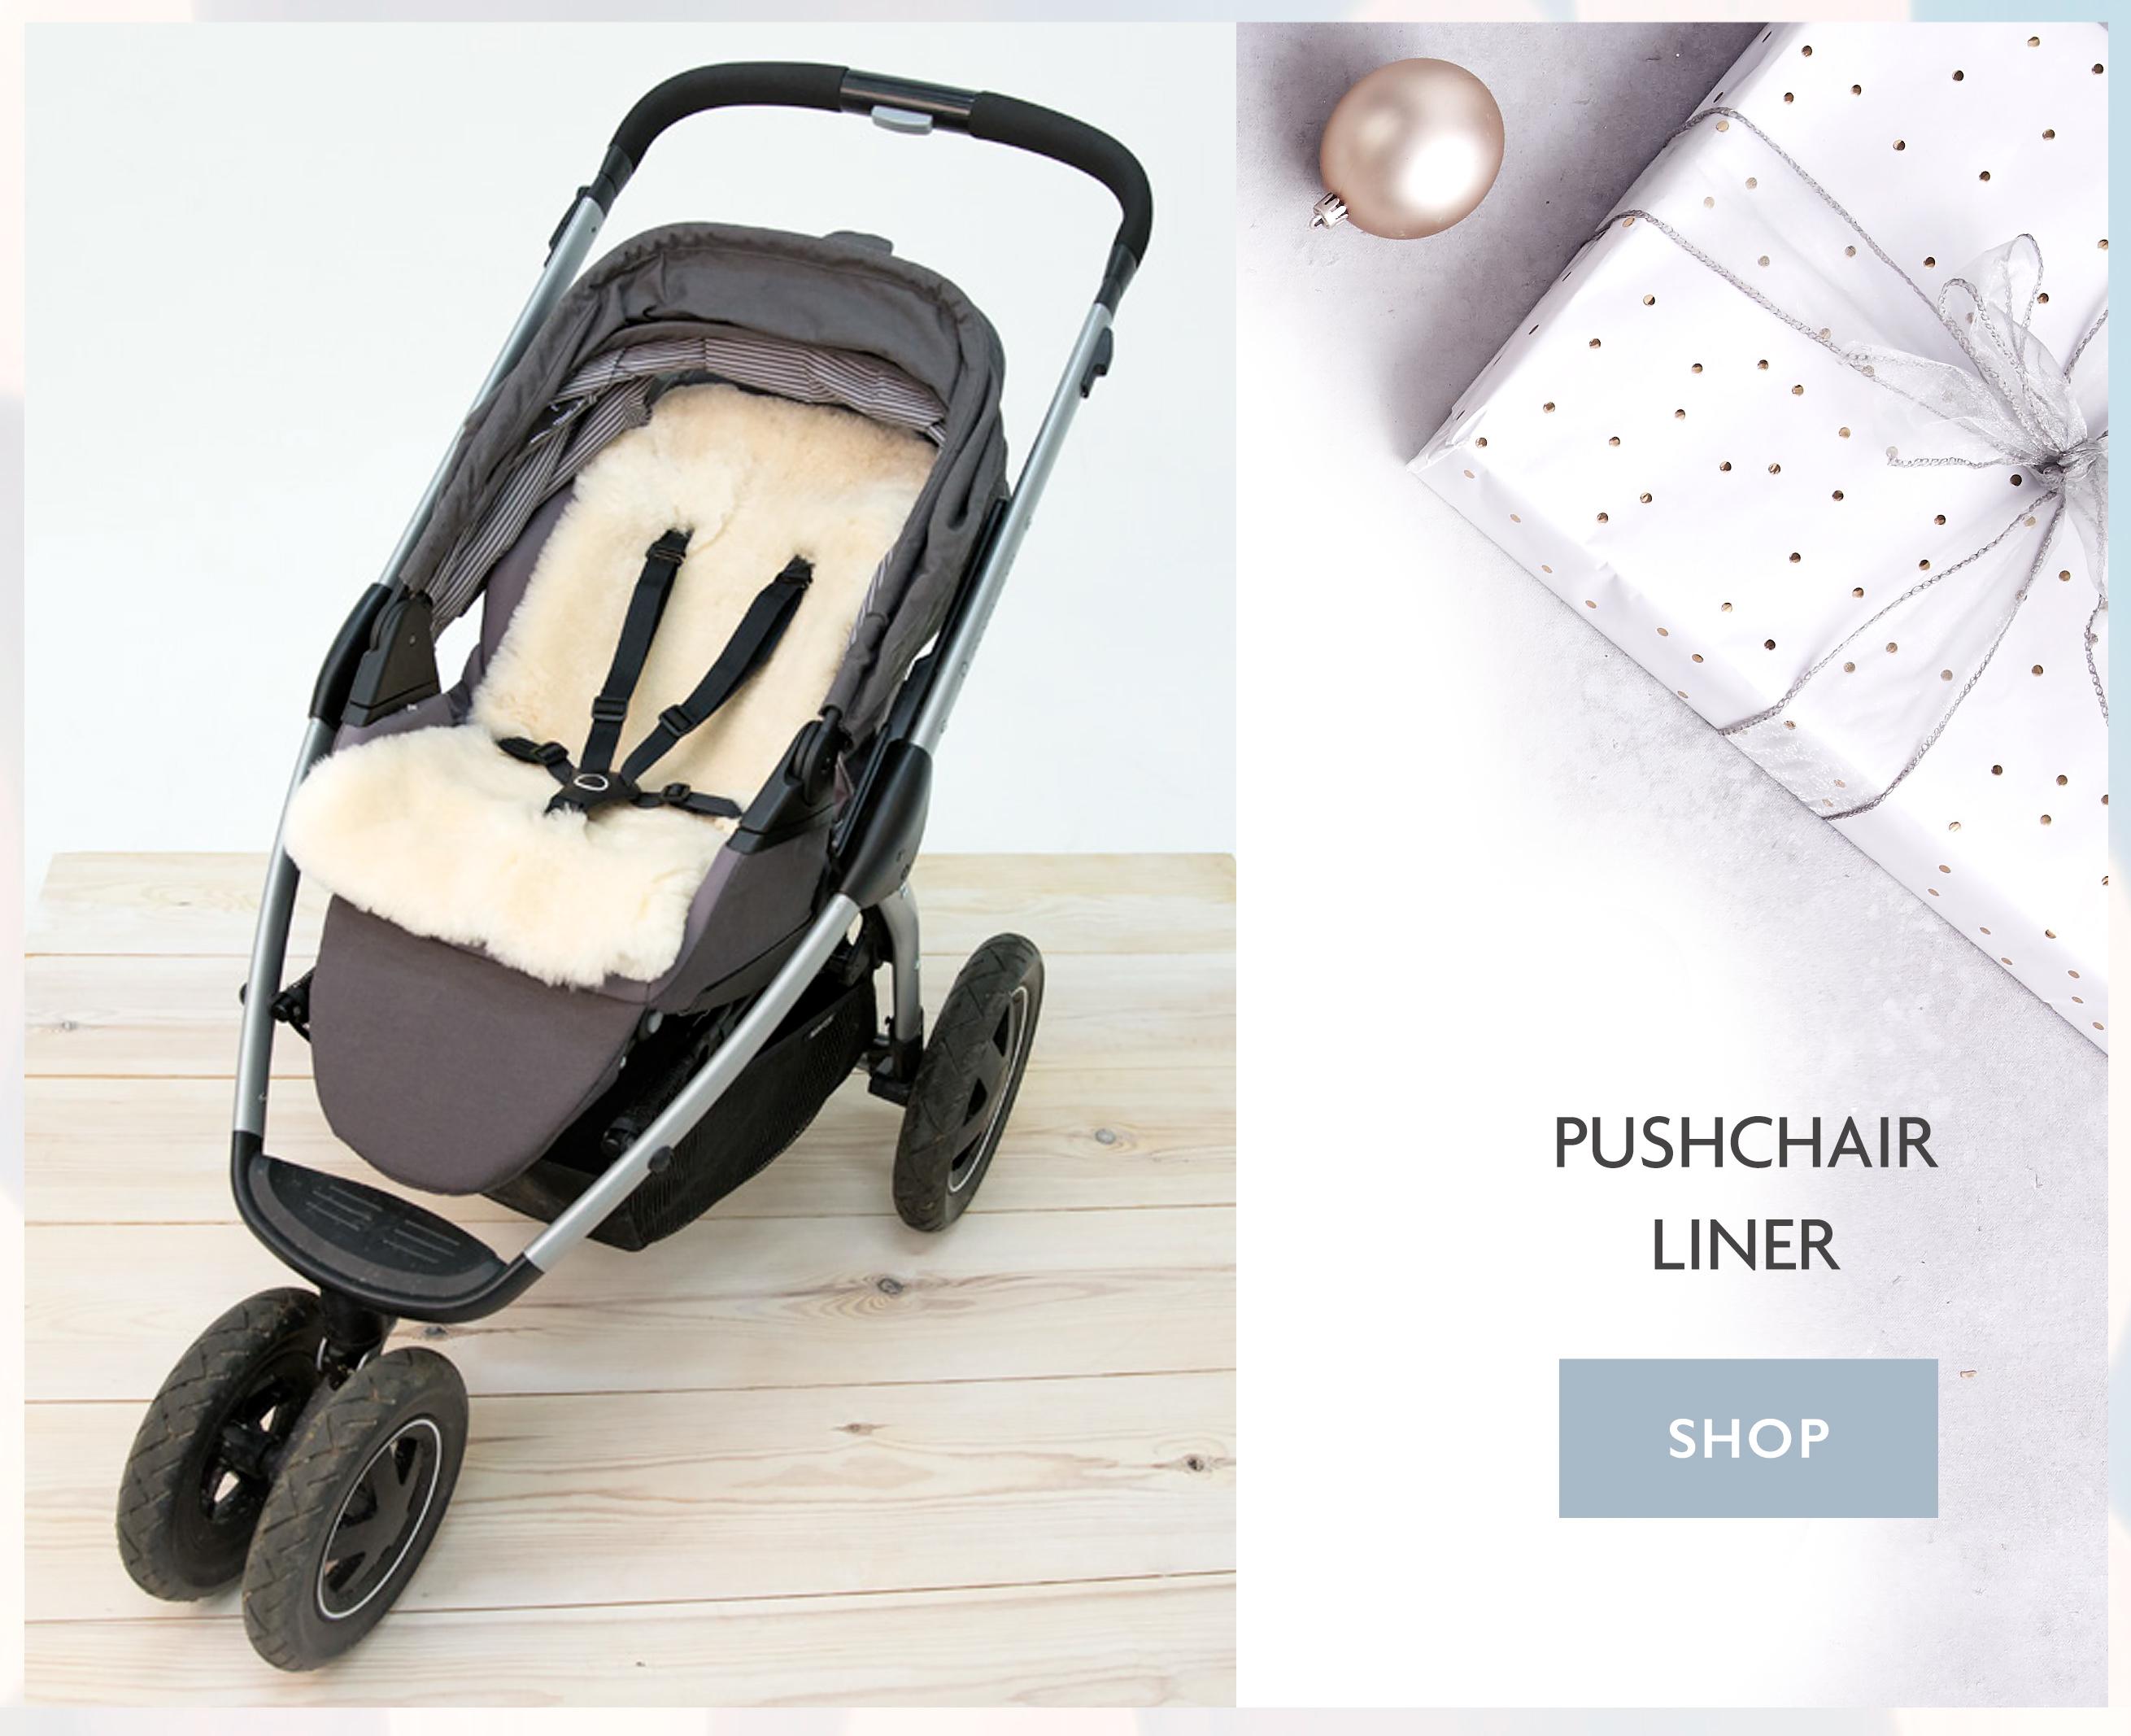 Pushchair Liner